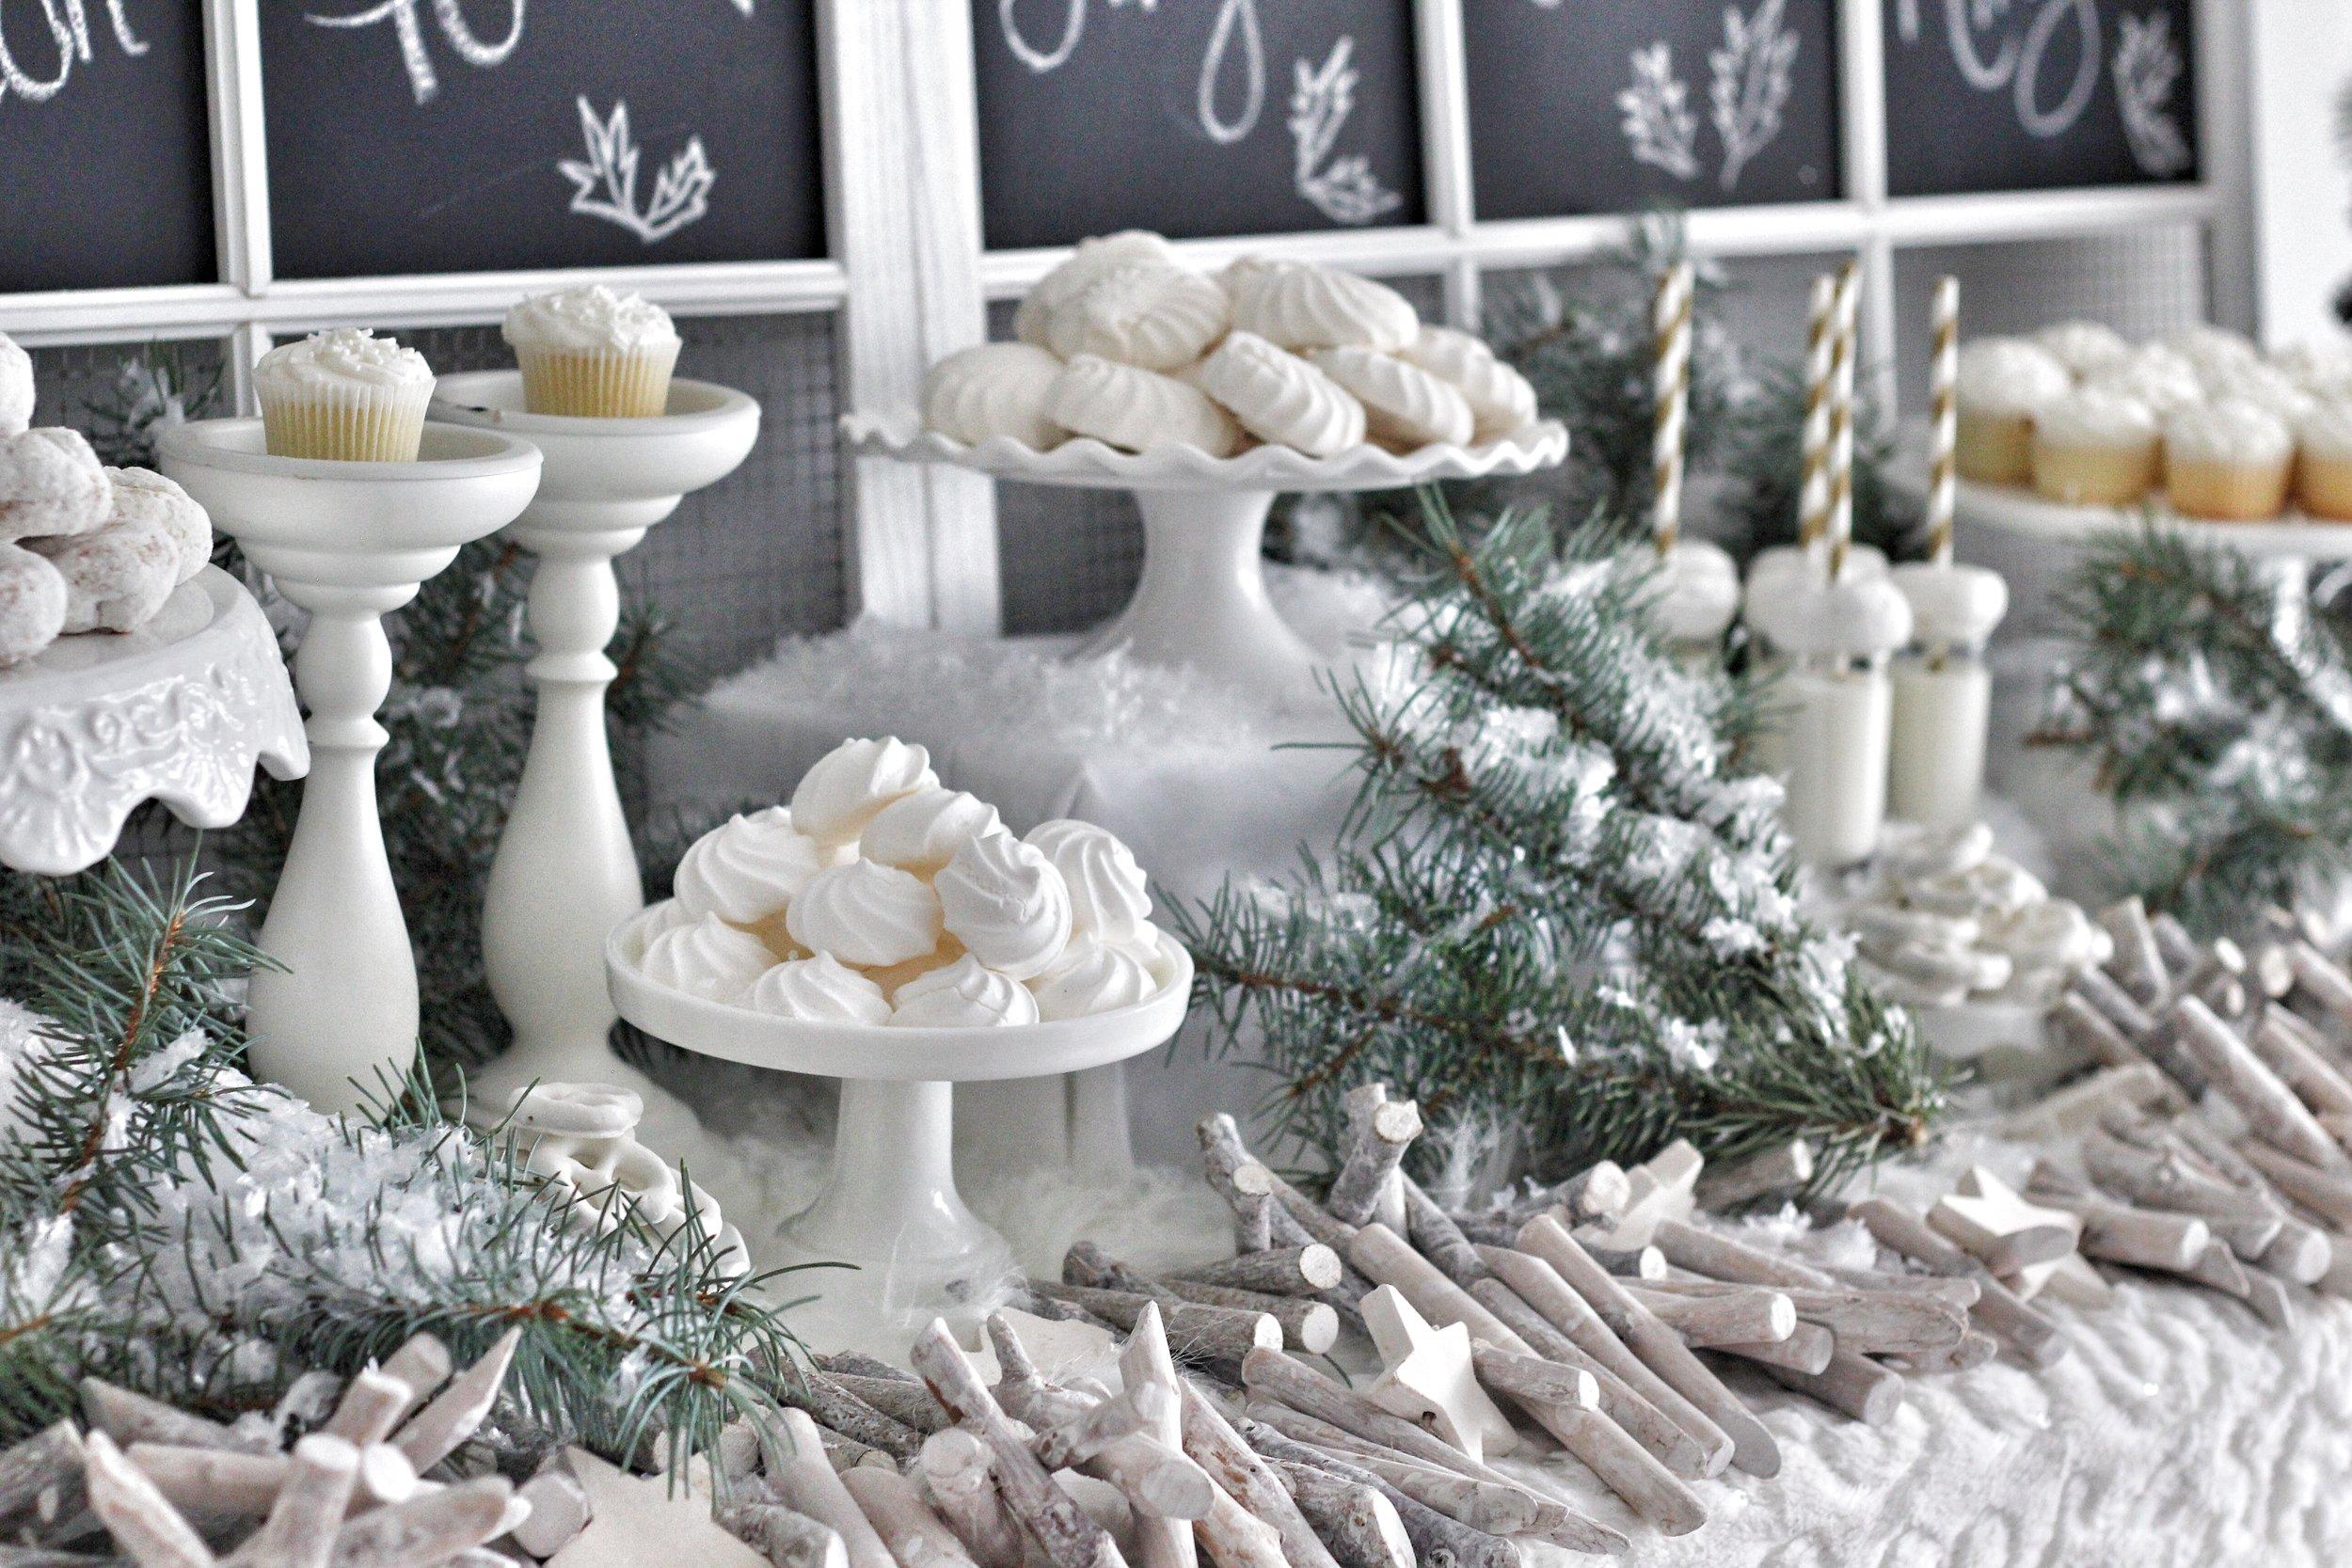 jingle-mingle-dessert-bar-3-1217.jpg